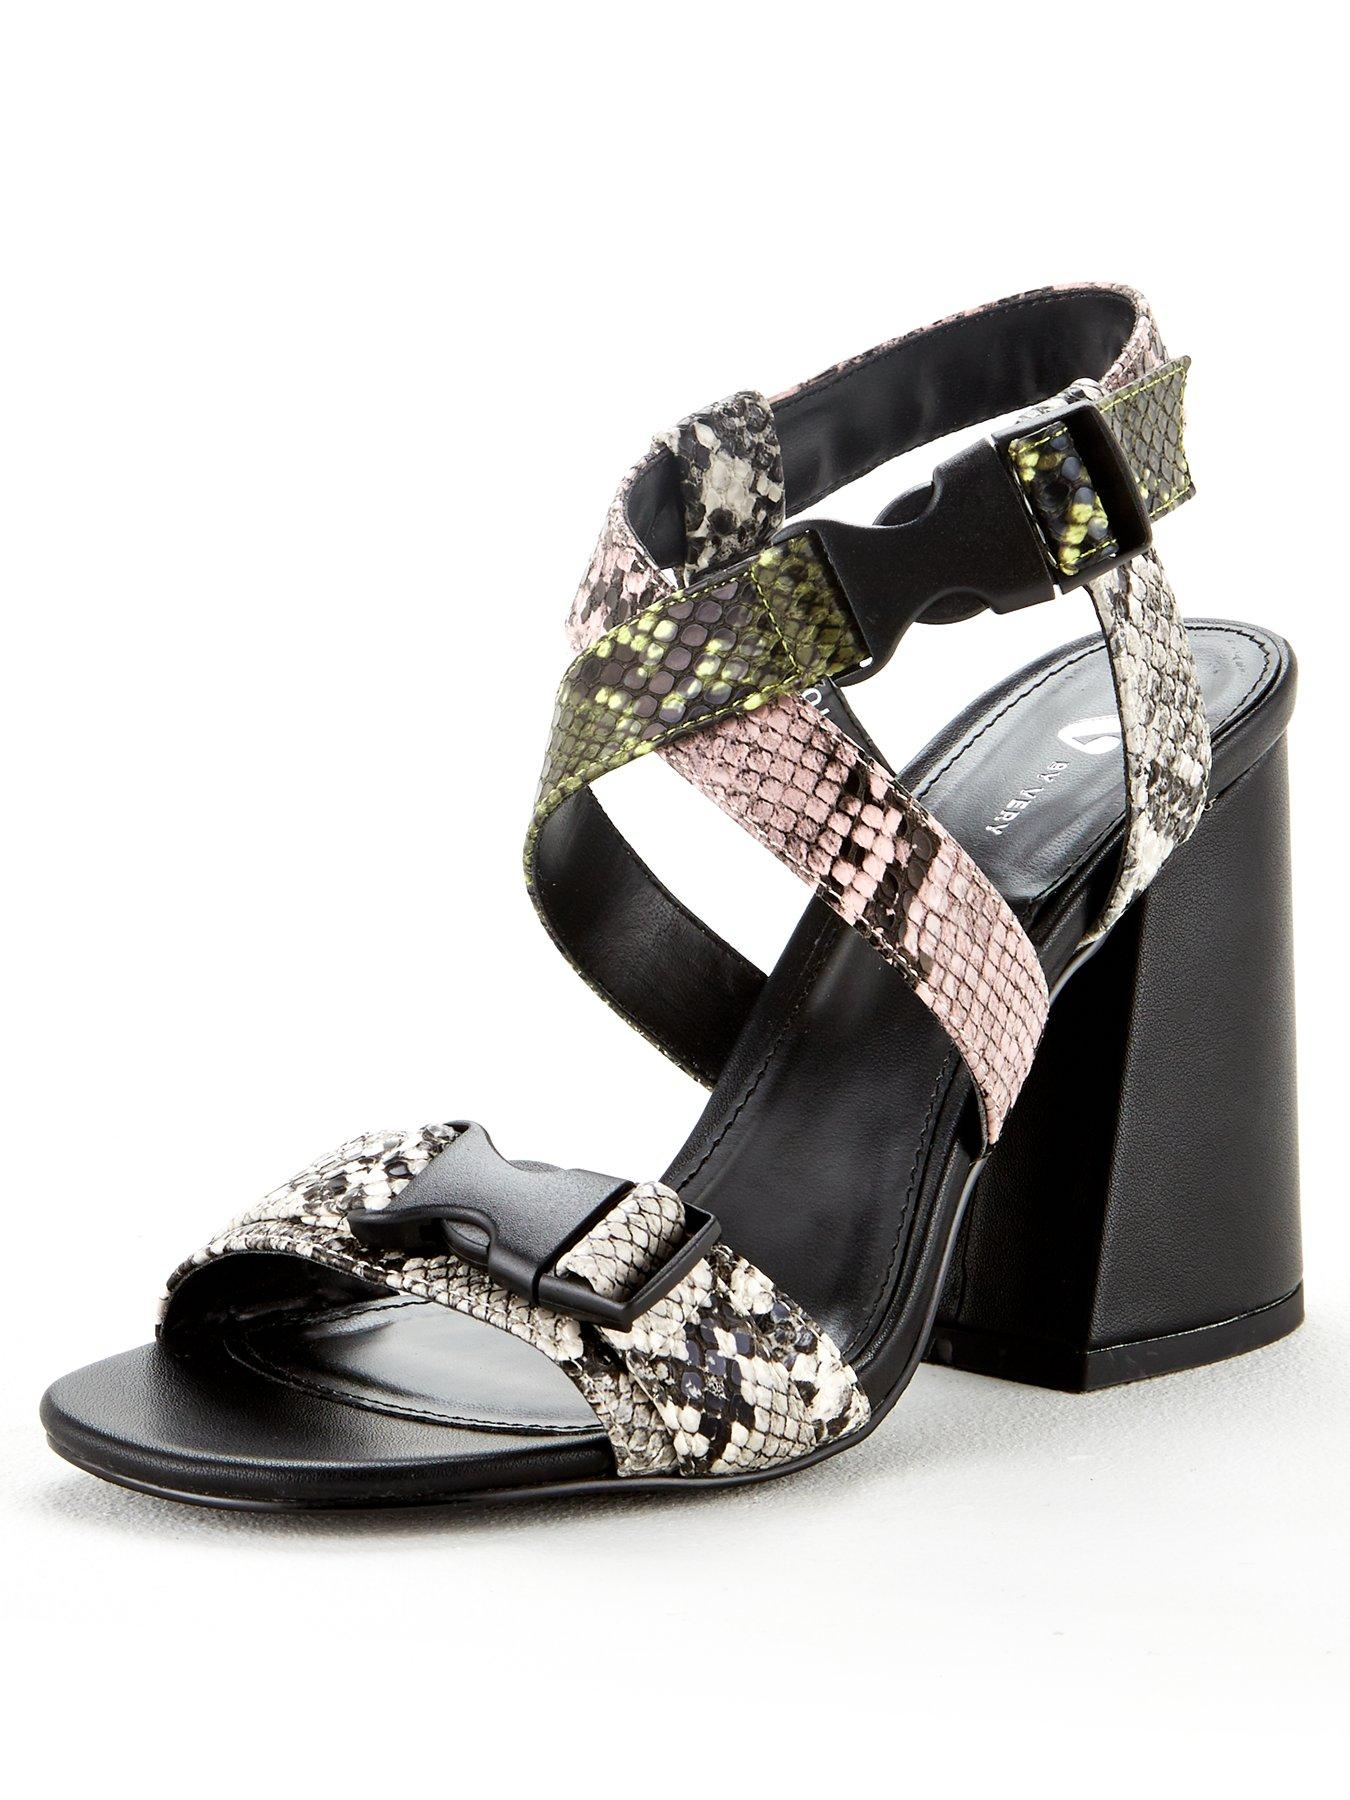 5CM Rhinestone Crystal Charms High Heels Boot Adorn Shoes Corsage DIY Accessory